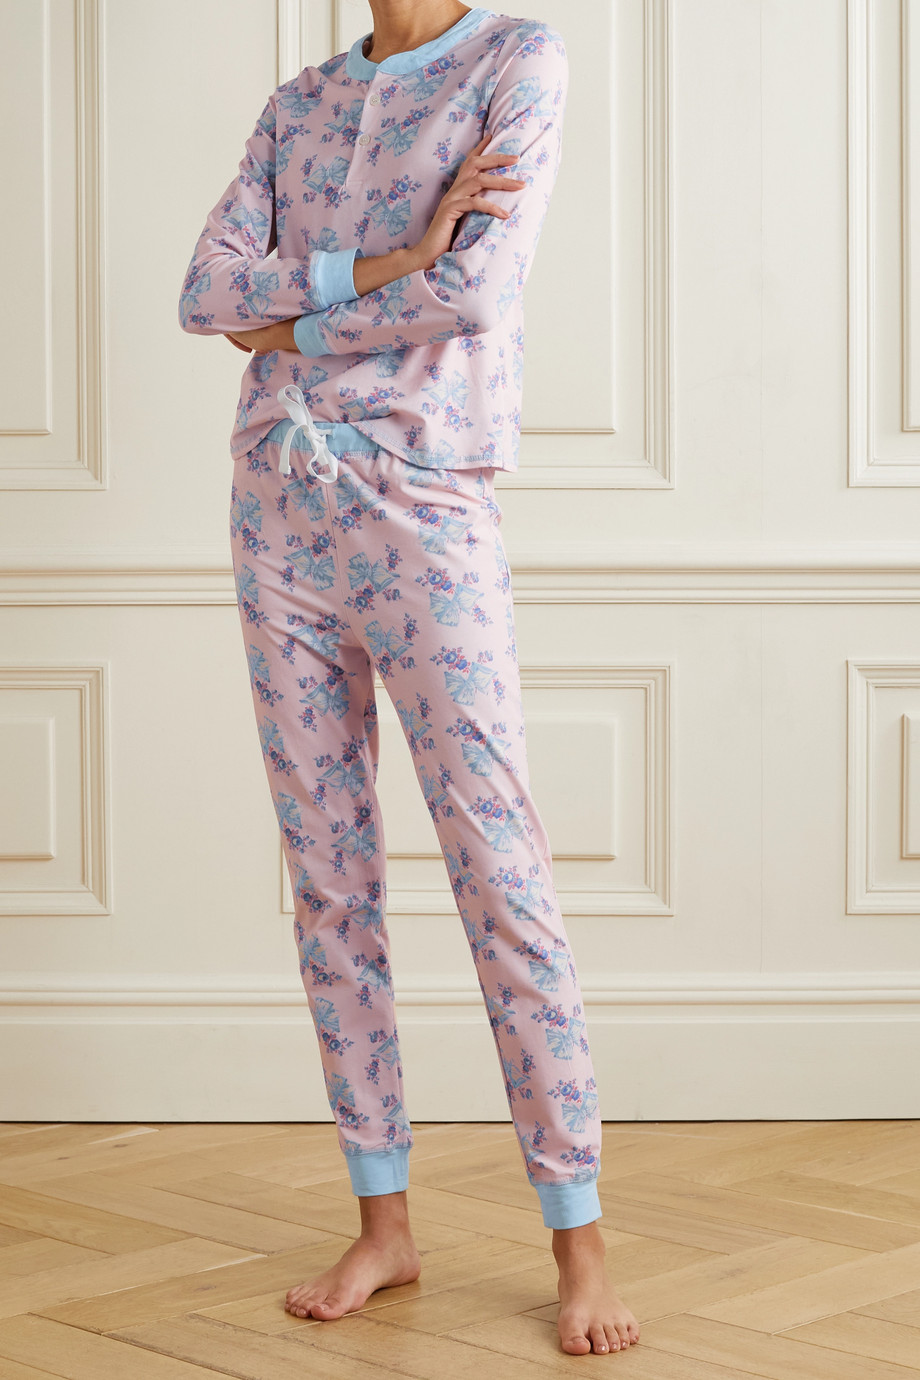 Morgan Lane + LoveShackFancy Kaia floral-print stretch-jersey pajama set